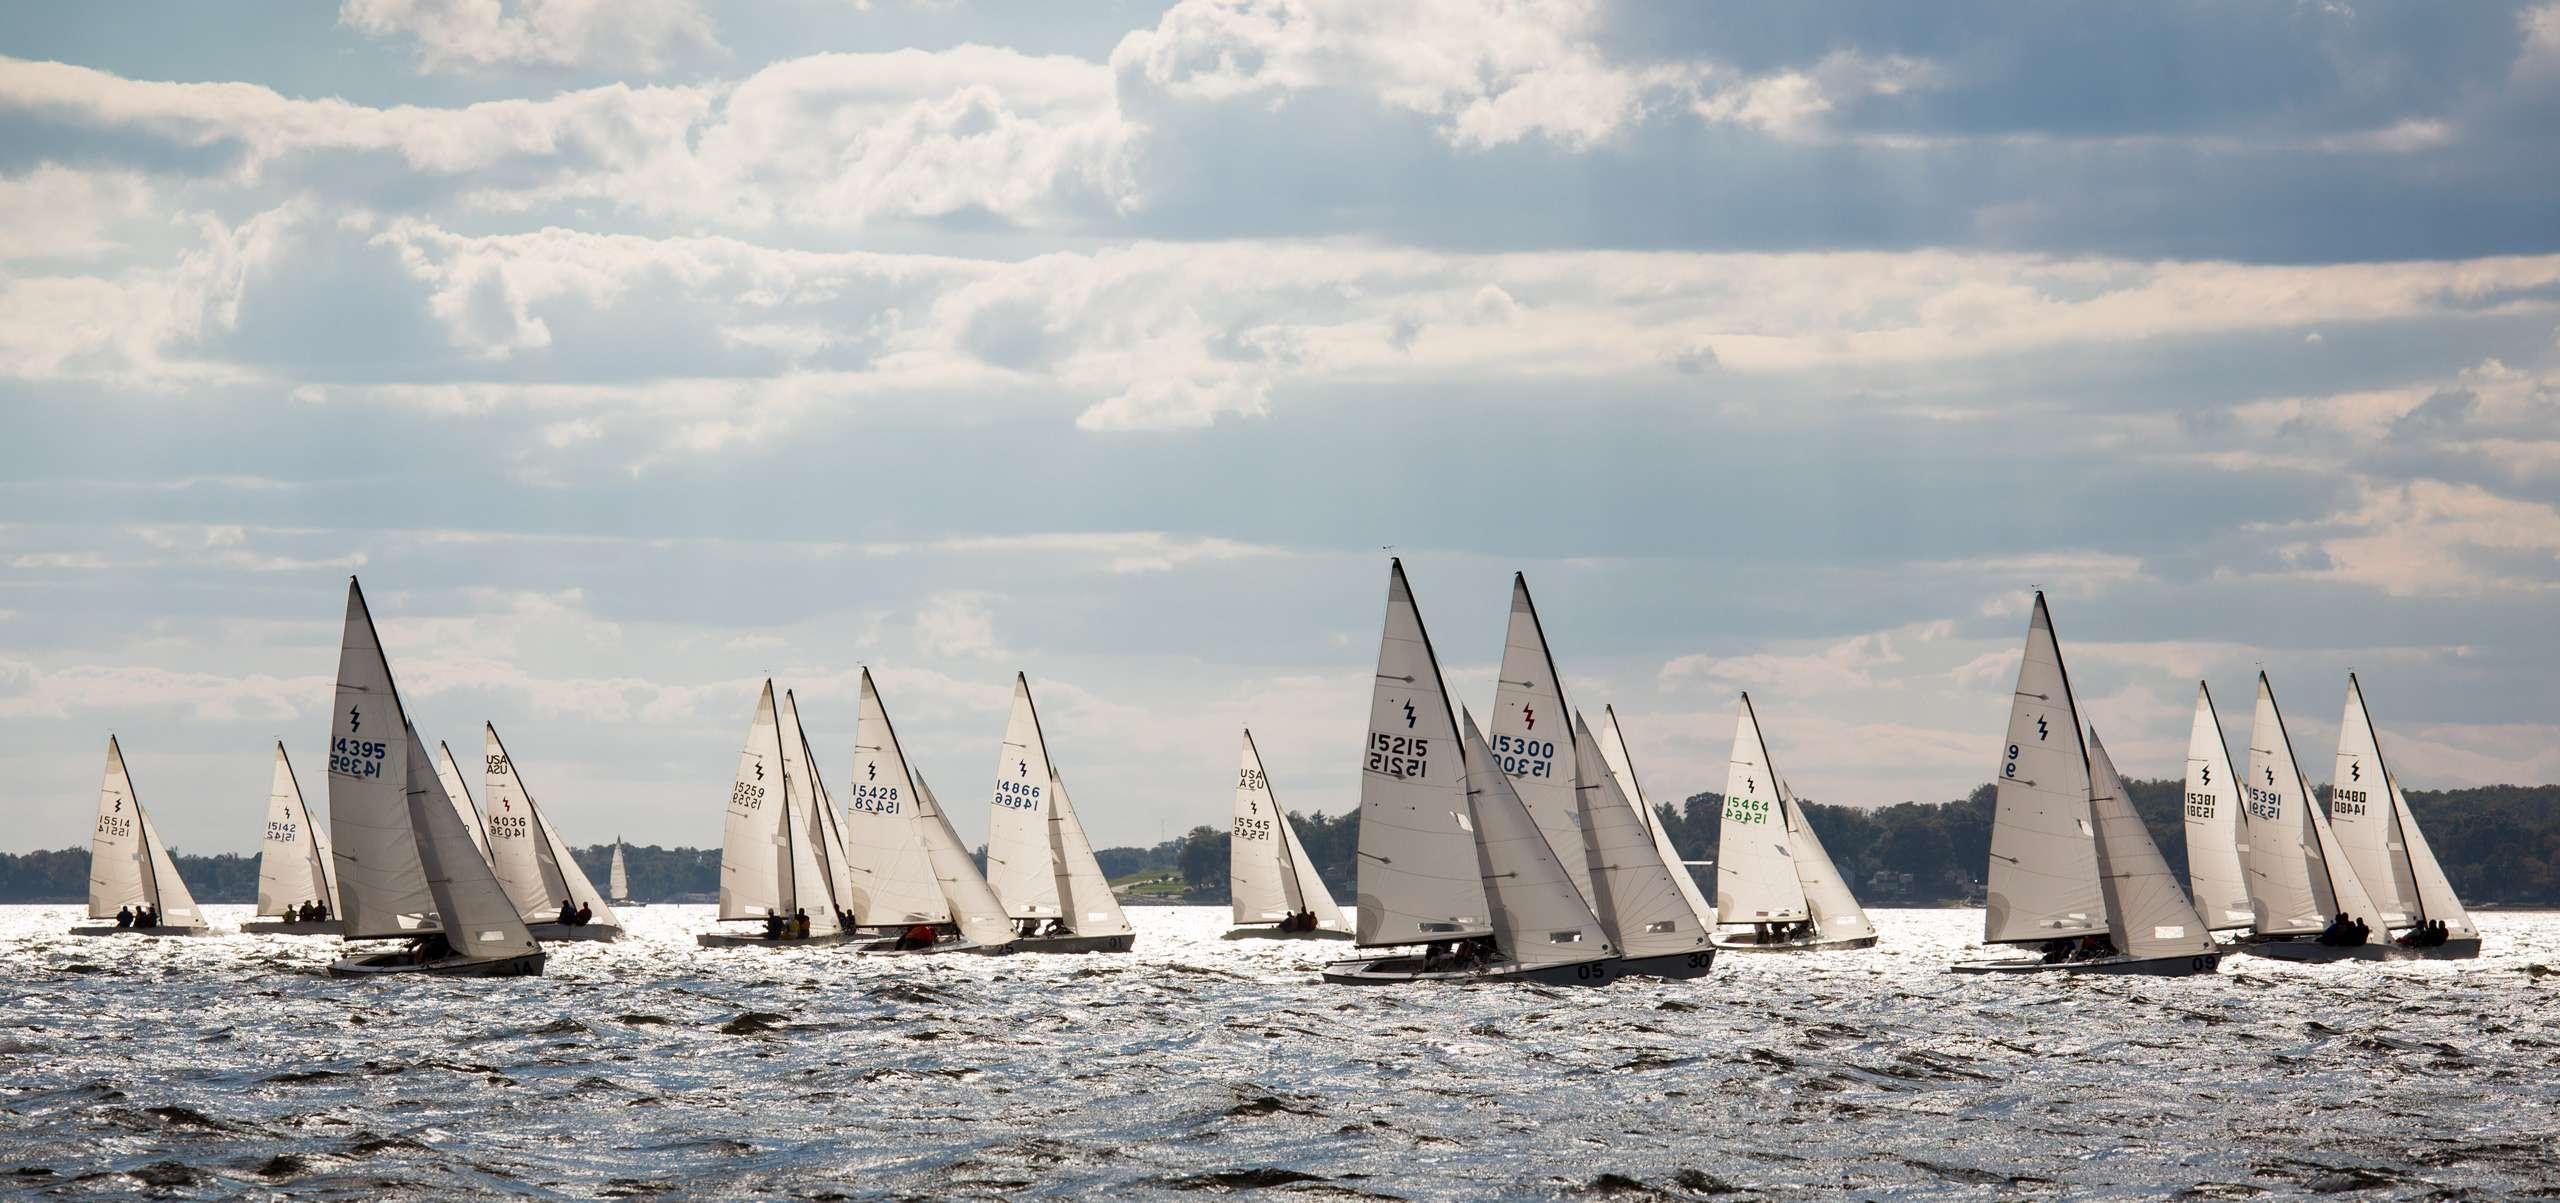 PORTFOLIO - Sailing - Chesapeake #3   PCG749